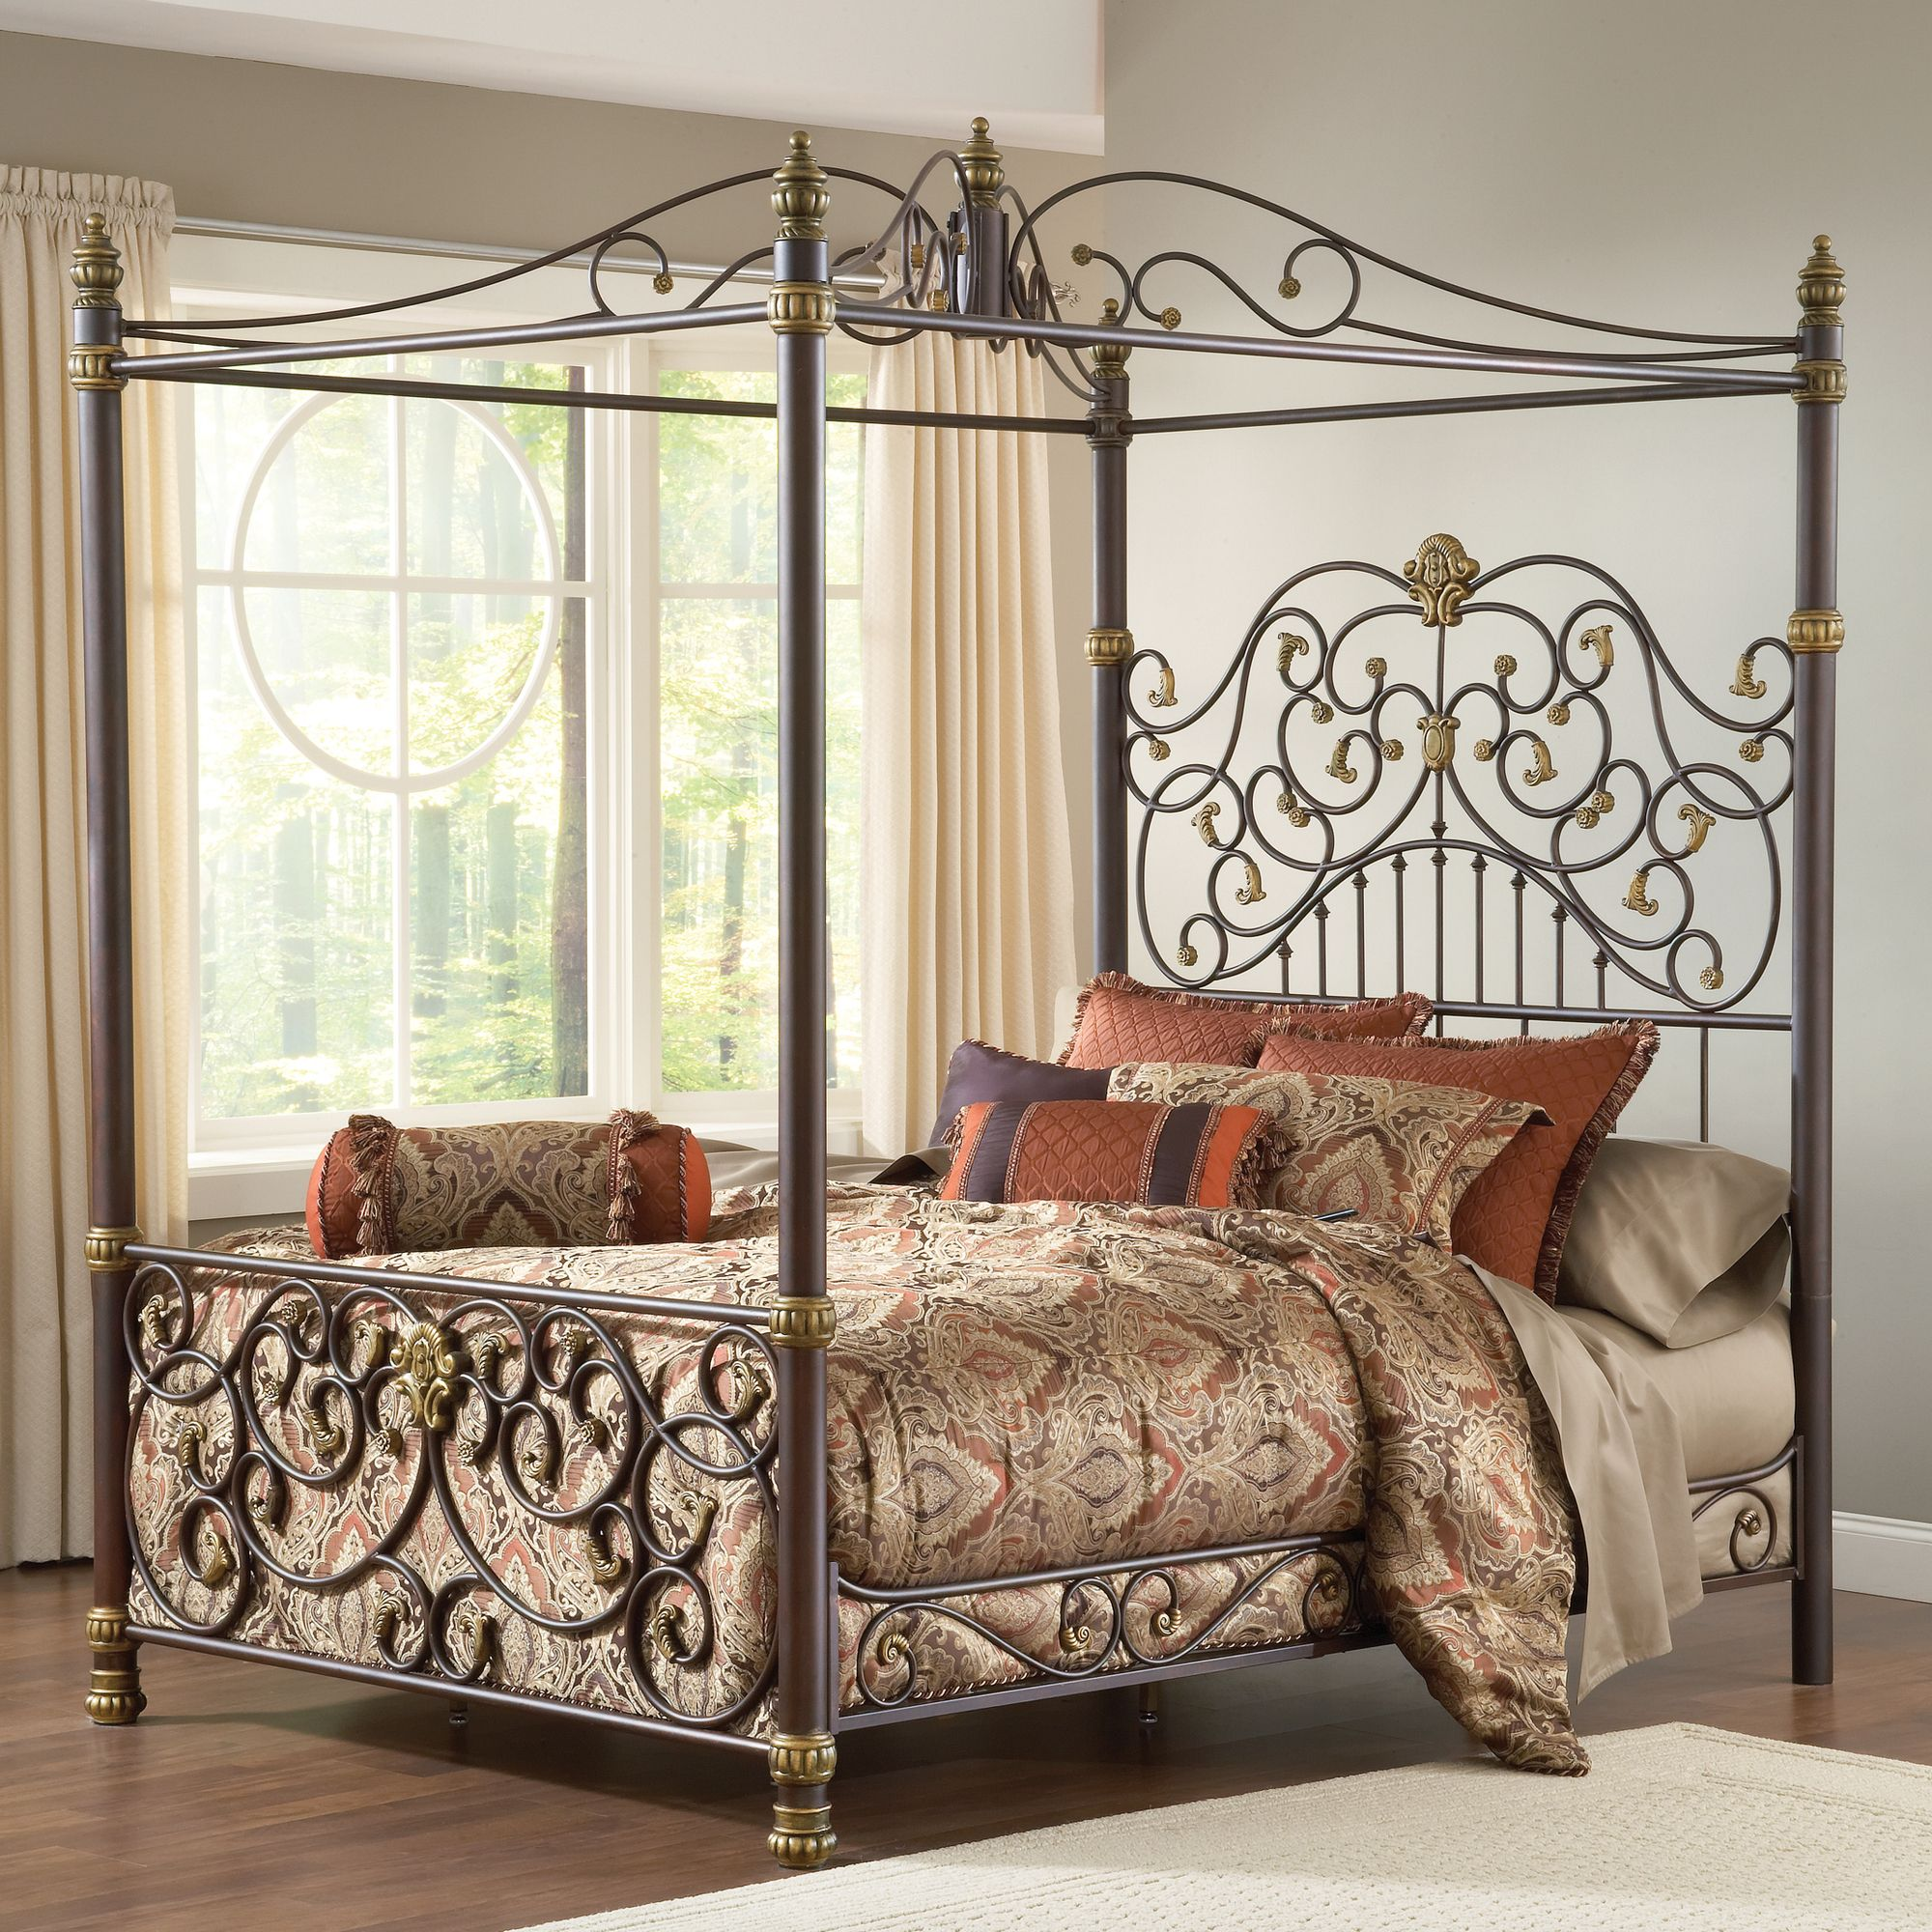 Hillsdale Stanton Canopy Bed | Dream bedroom | Pinterest | Hierro ...